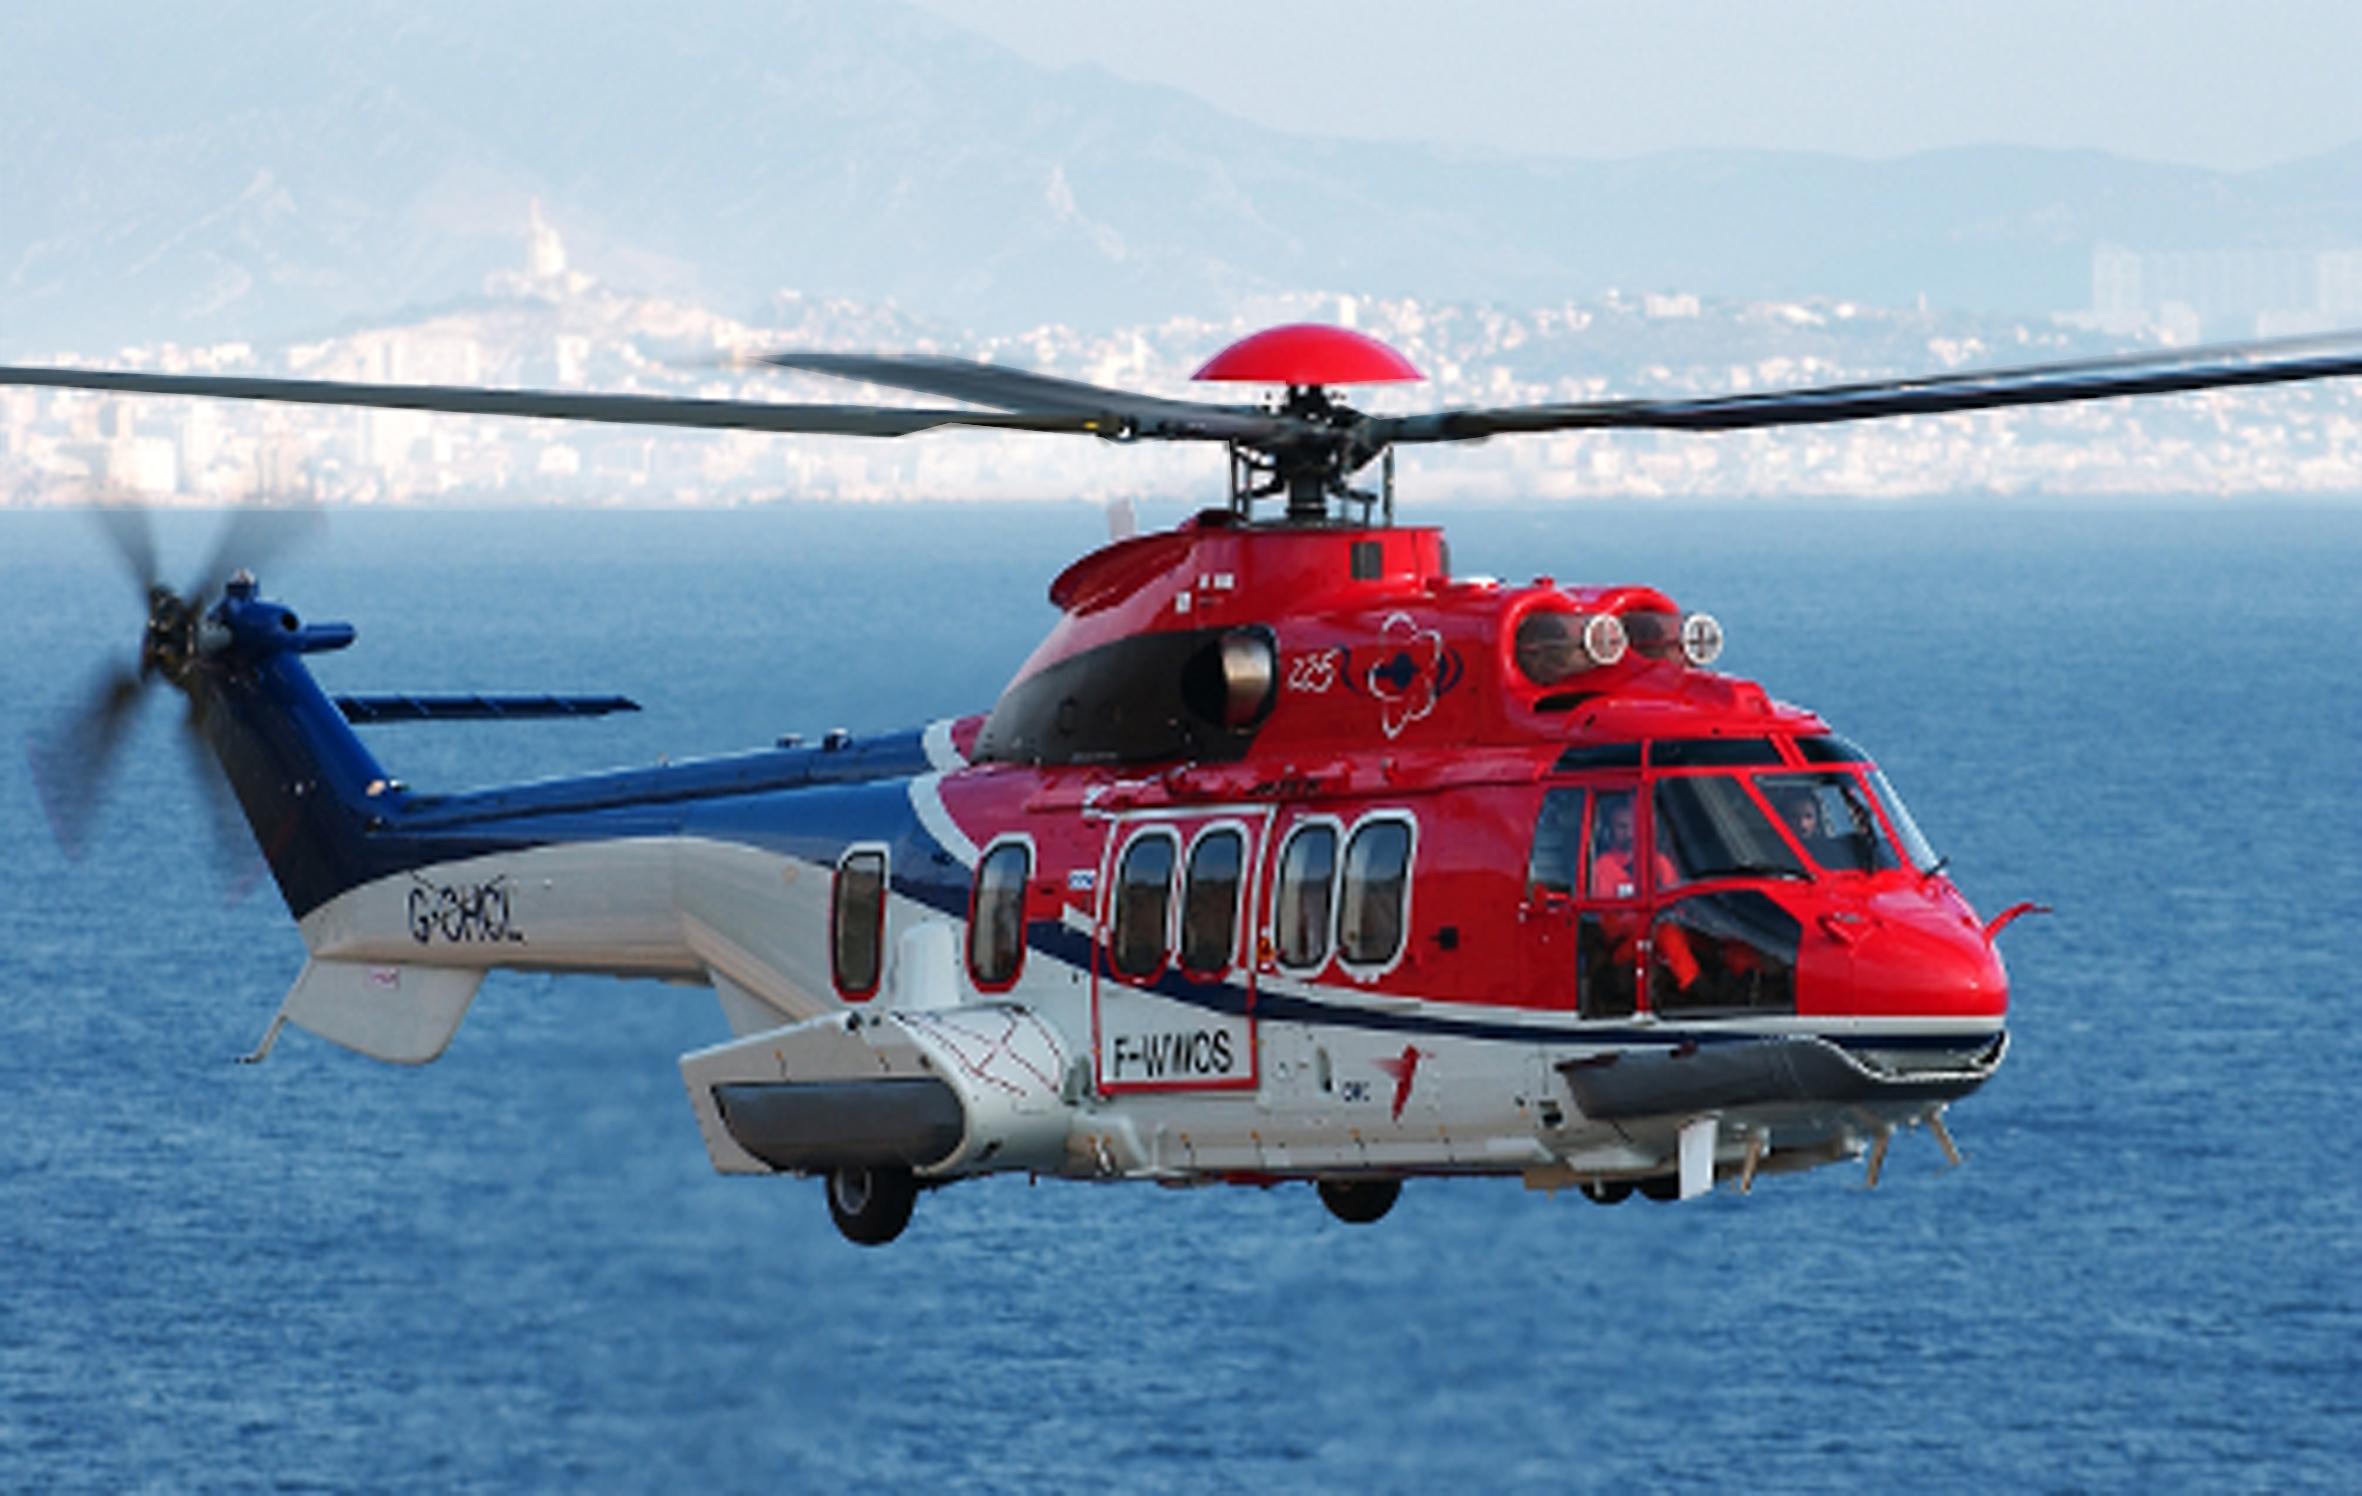 The Super Puma H225 crashed near the Norwegian city of Bergen.